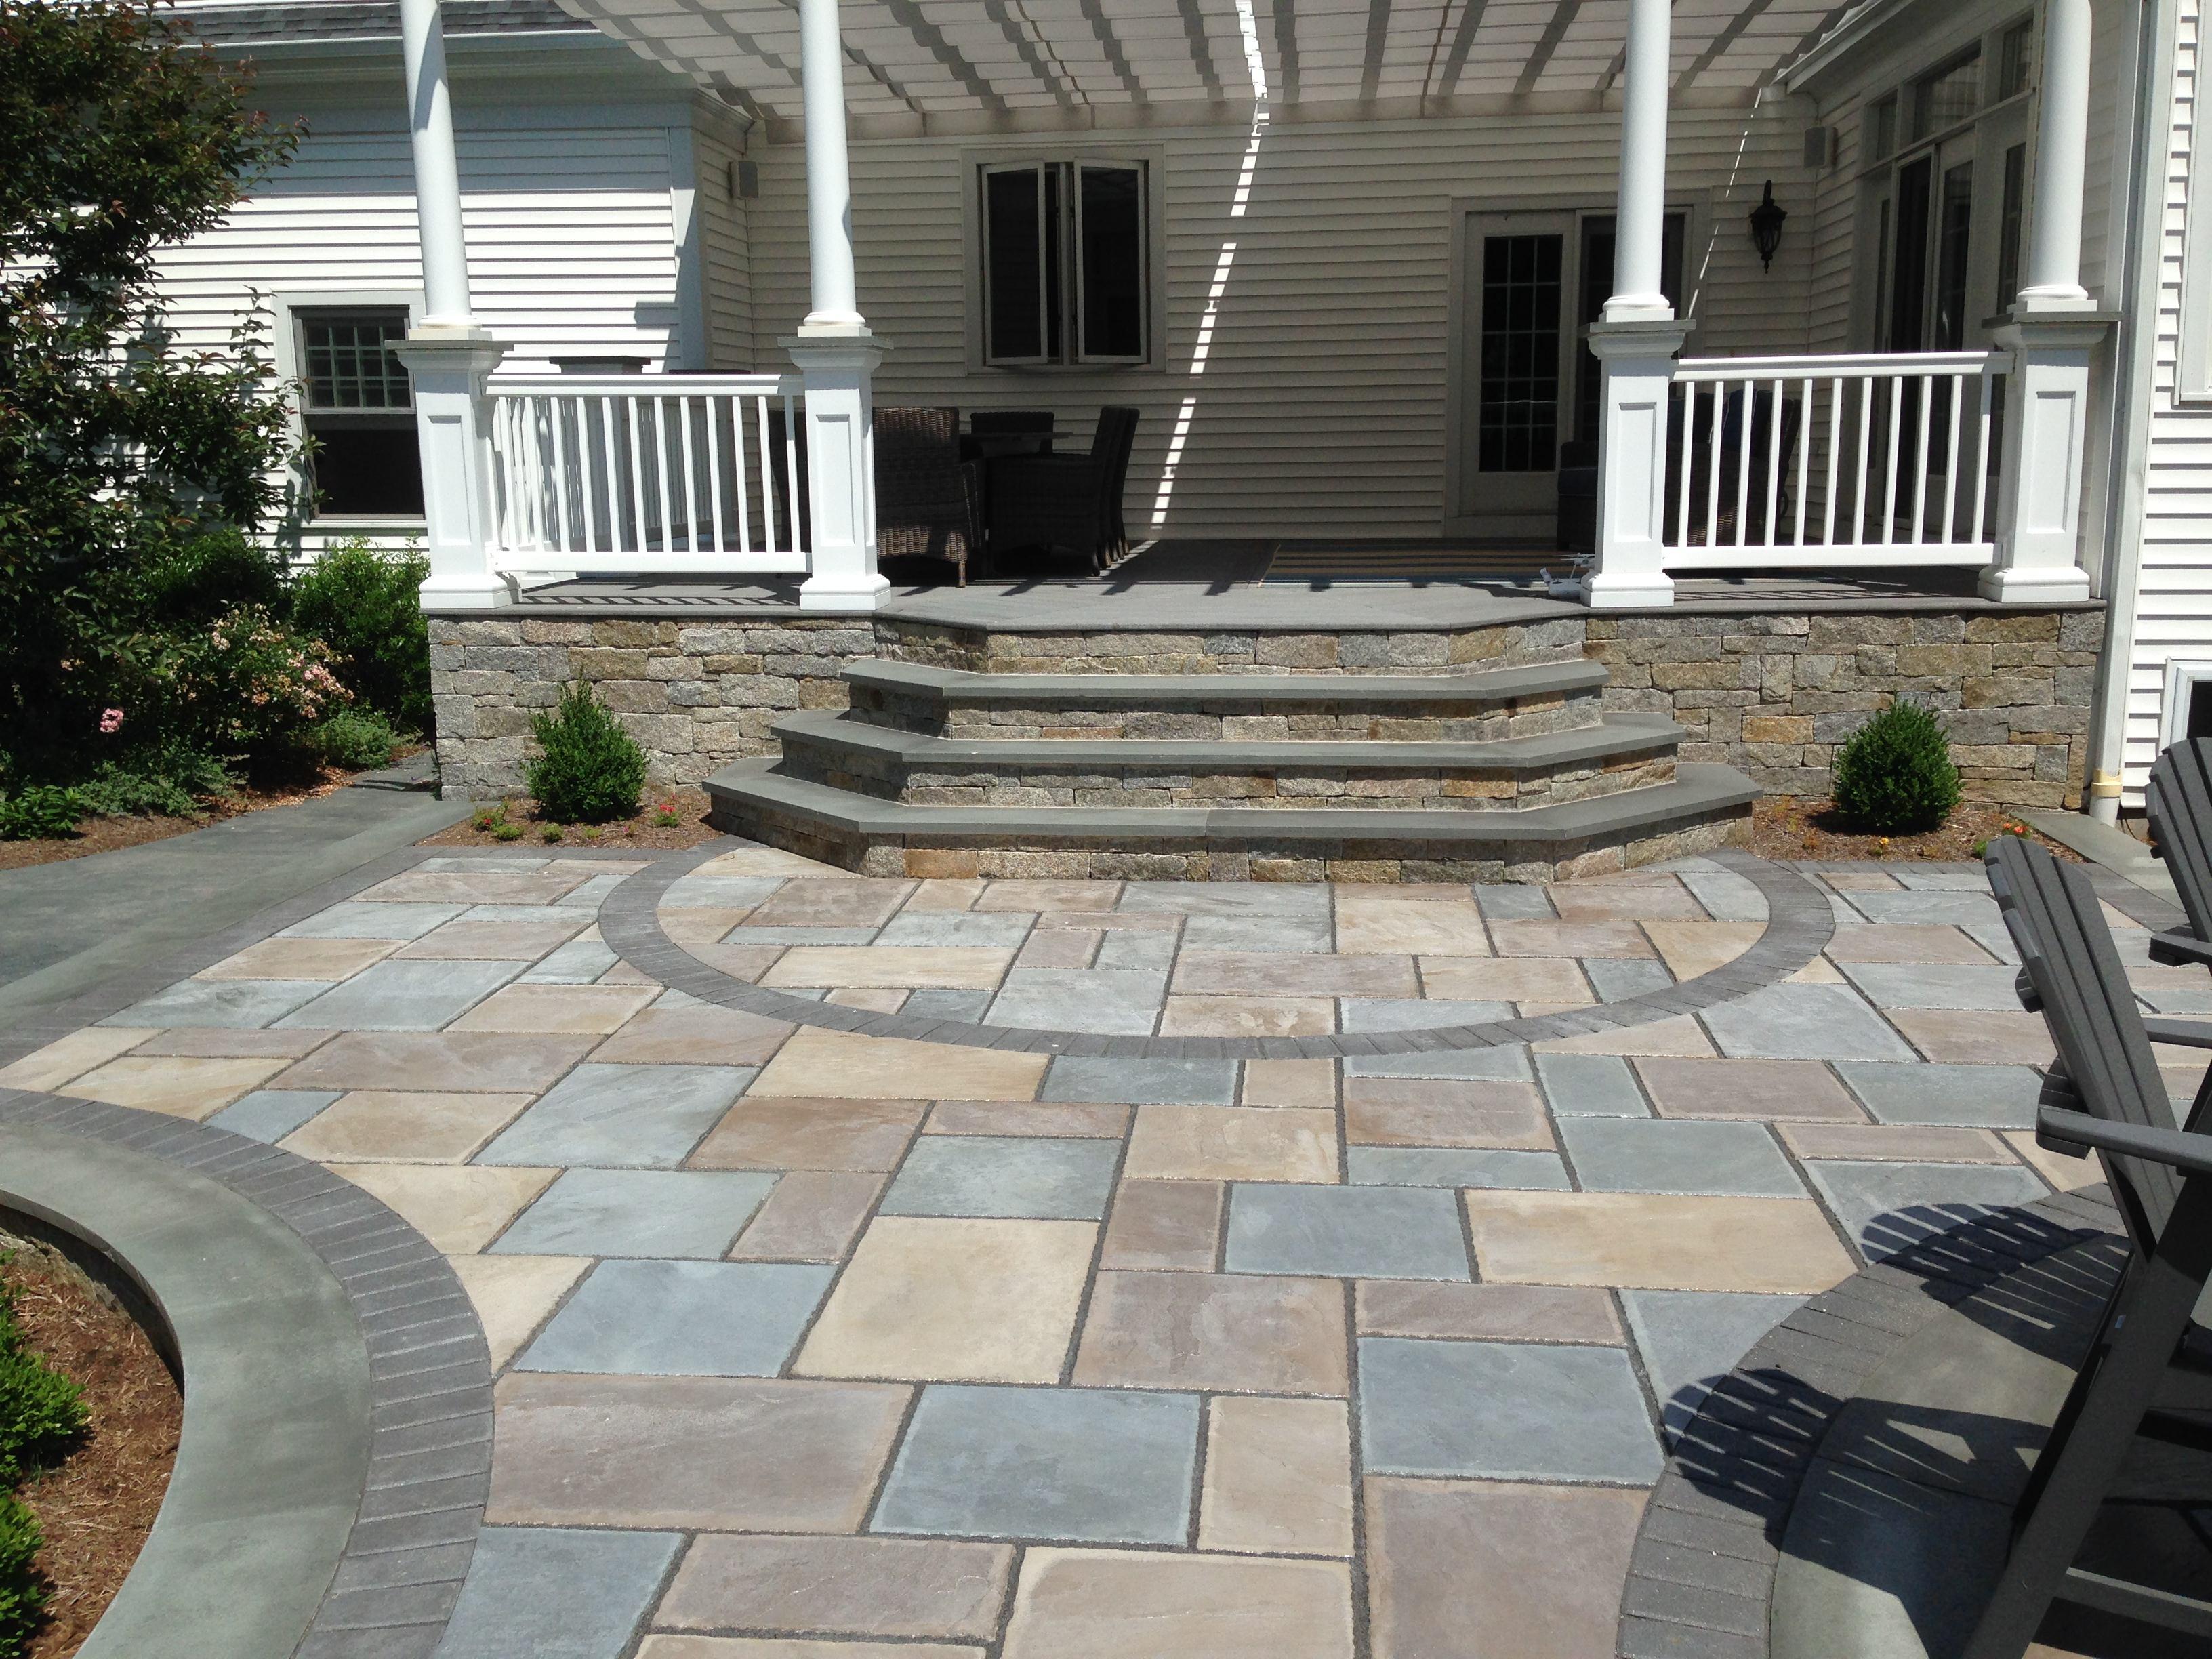 Steps|Refacing|Veneers|Front Stoop|Portfolio|Torrison ... on Small Backyard Stone Patio Ideas id=72549